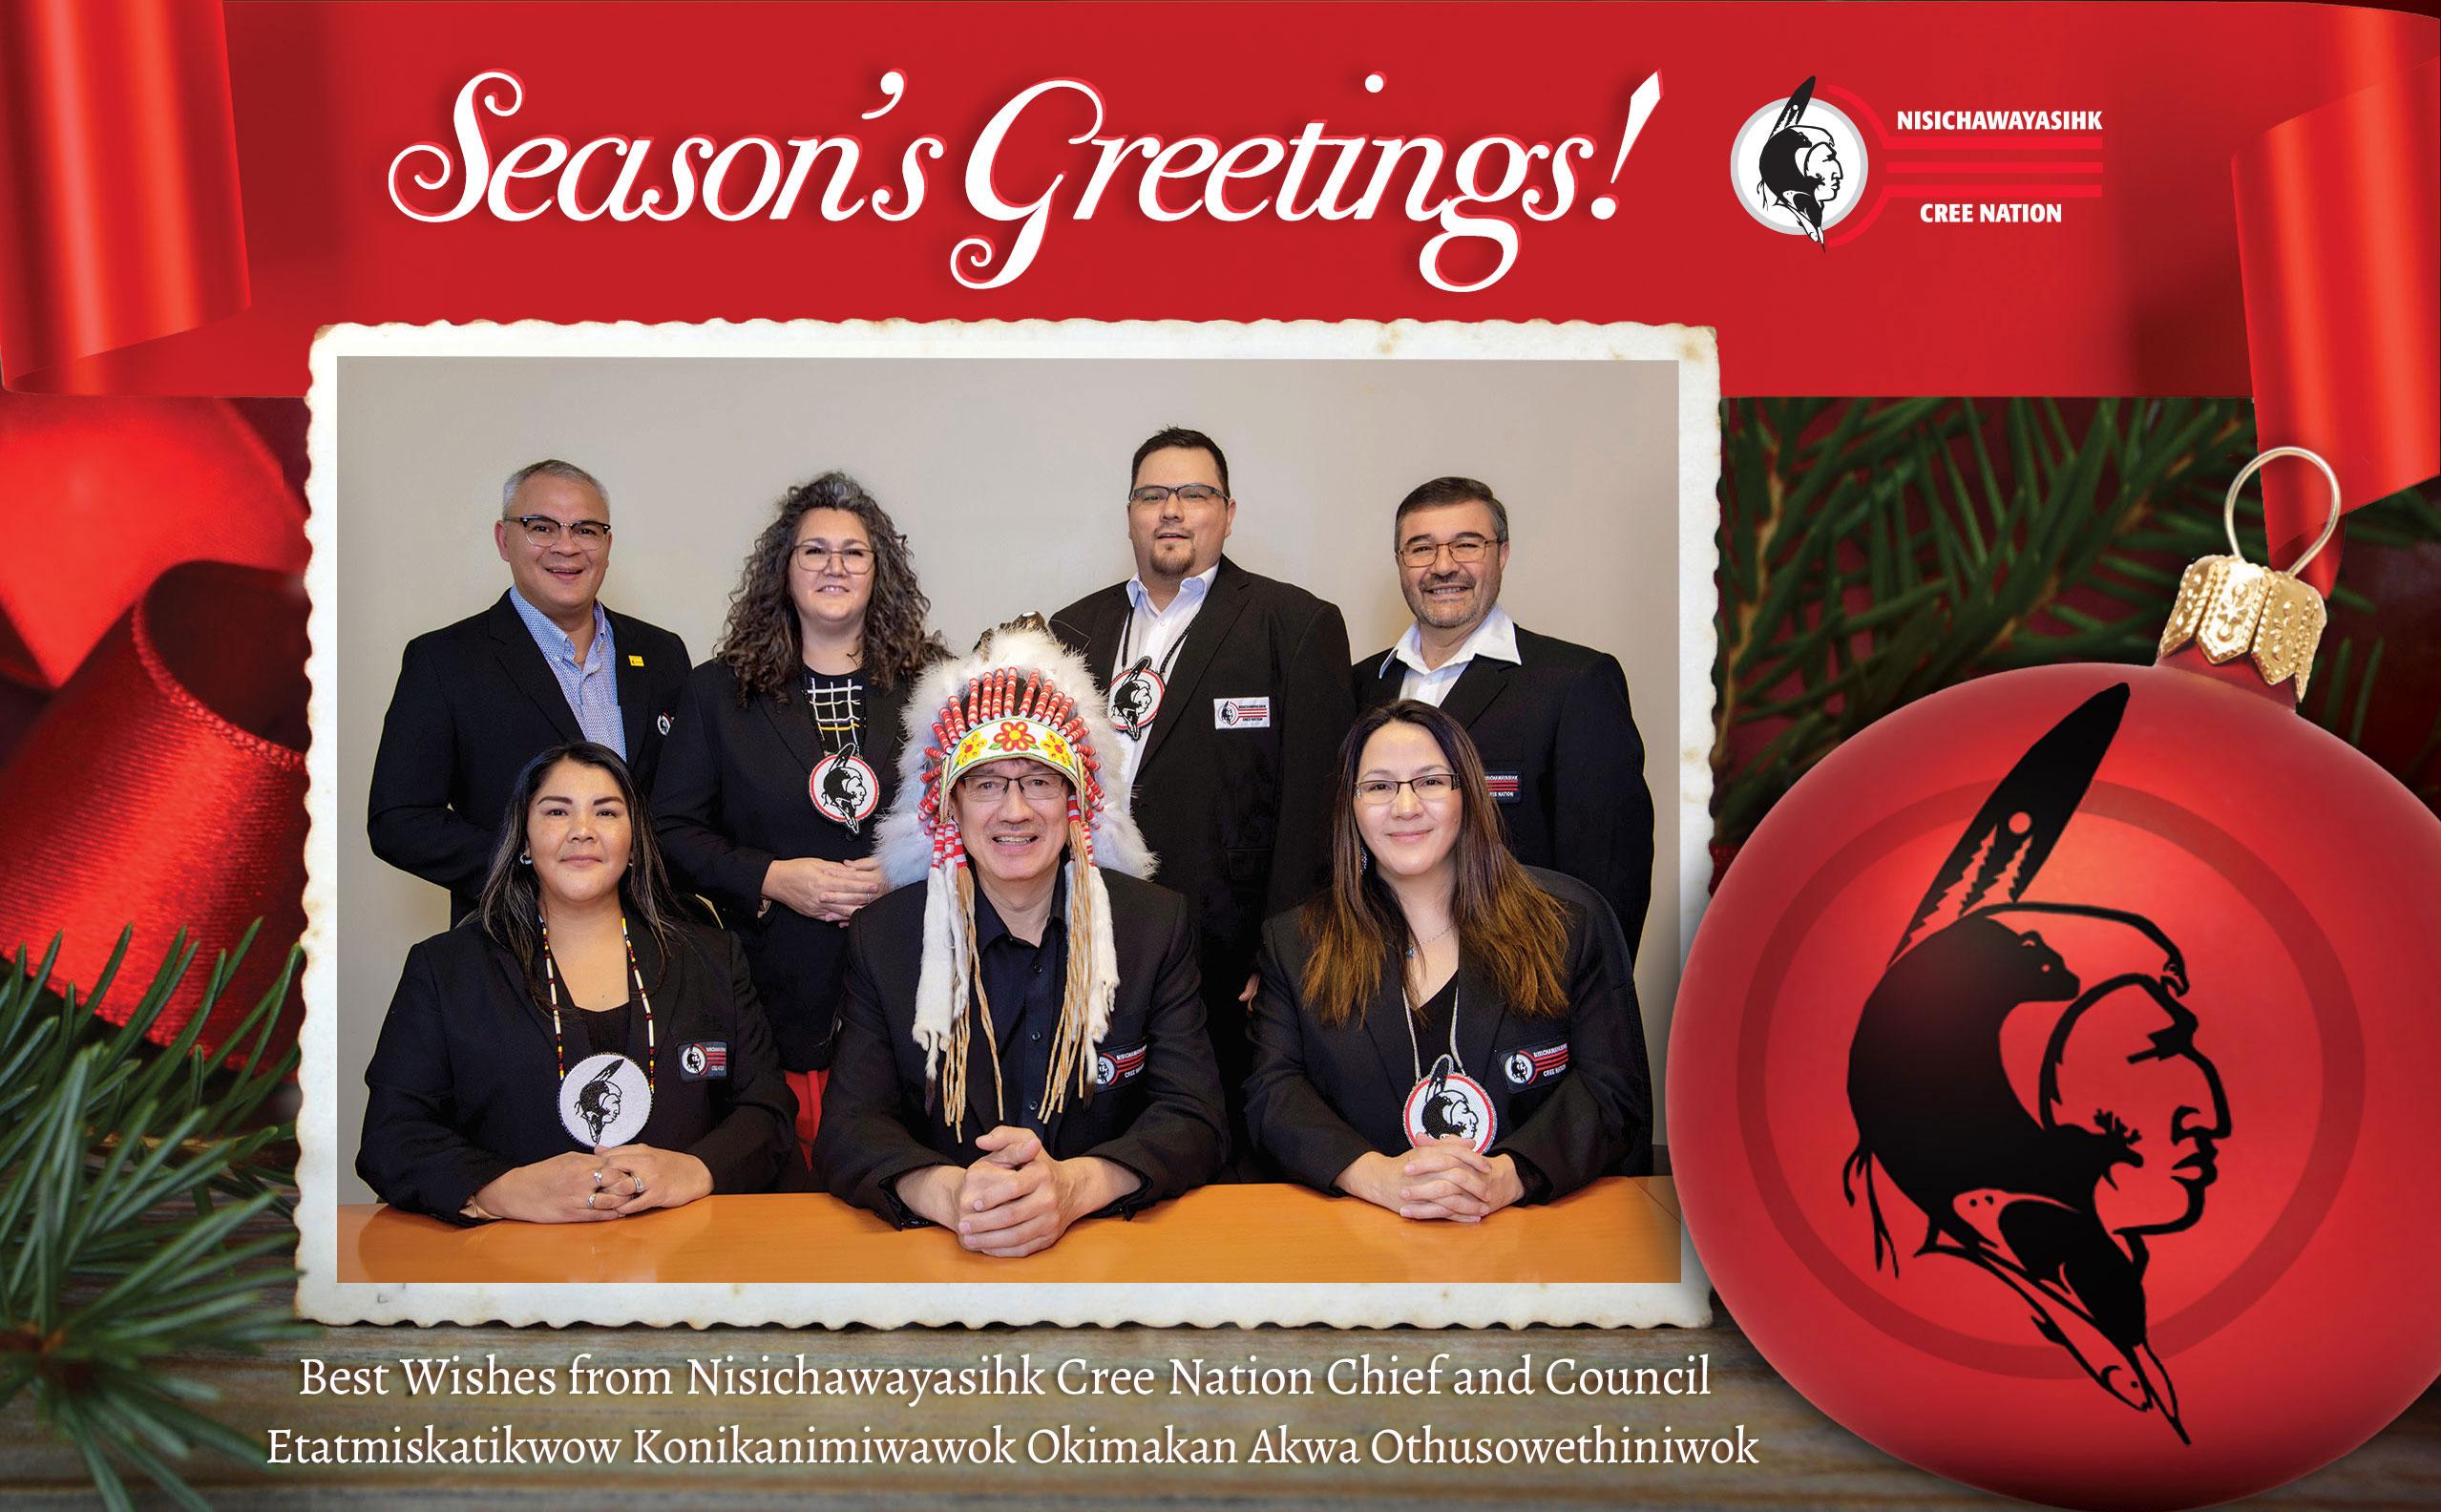 NCN Season's Greetings 2020